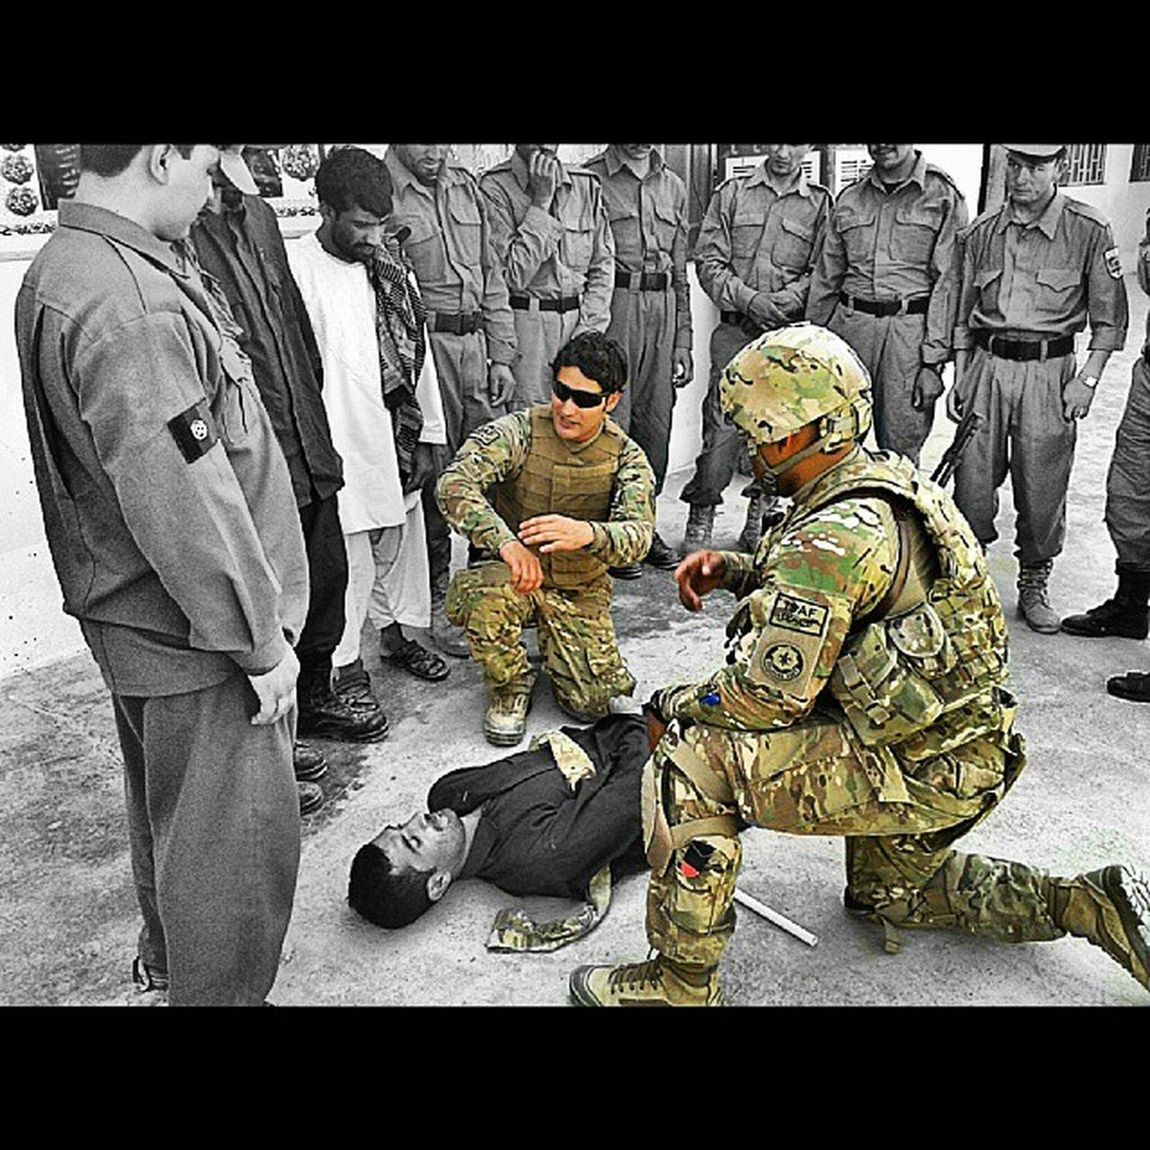 Training Afghans Firstaid Afghanpolice Kandahar city BGR bnw_society b_ig instagramers igers instafollow tagsforlikes tagstagramers tagsta tumblr tweegram thebesteditor thebest_ofbest photowall_bw photowall_daily pixlar photogram_tr photorchestra peoplewatching